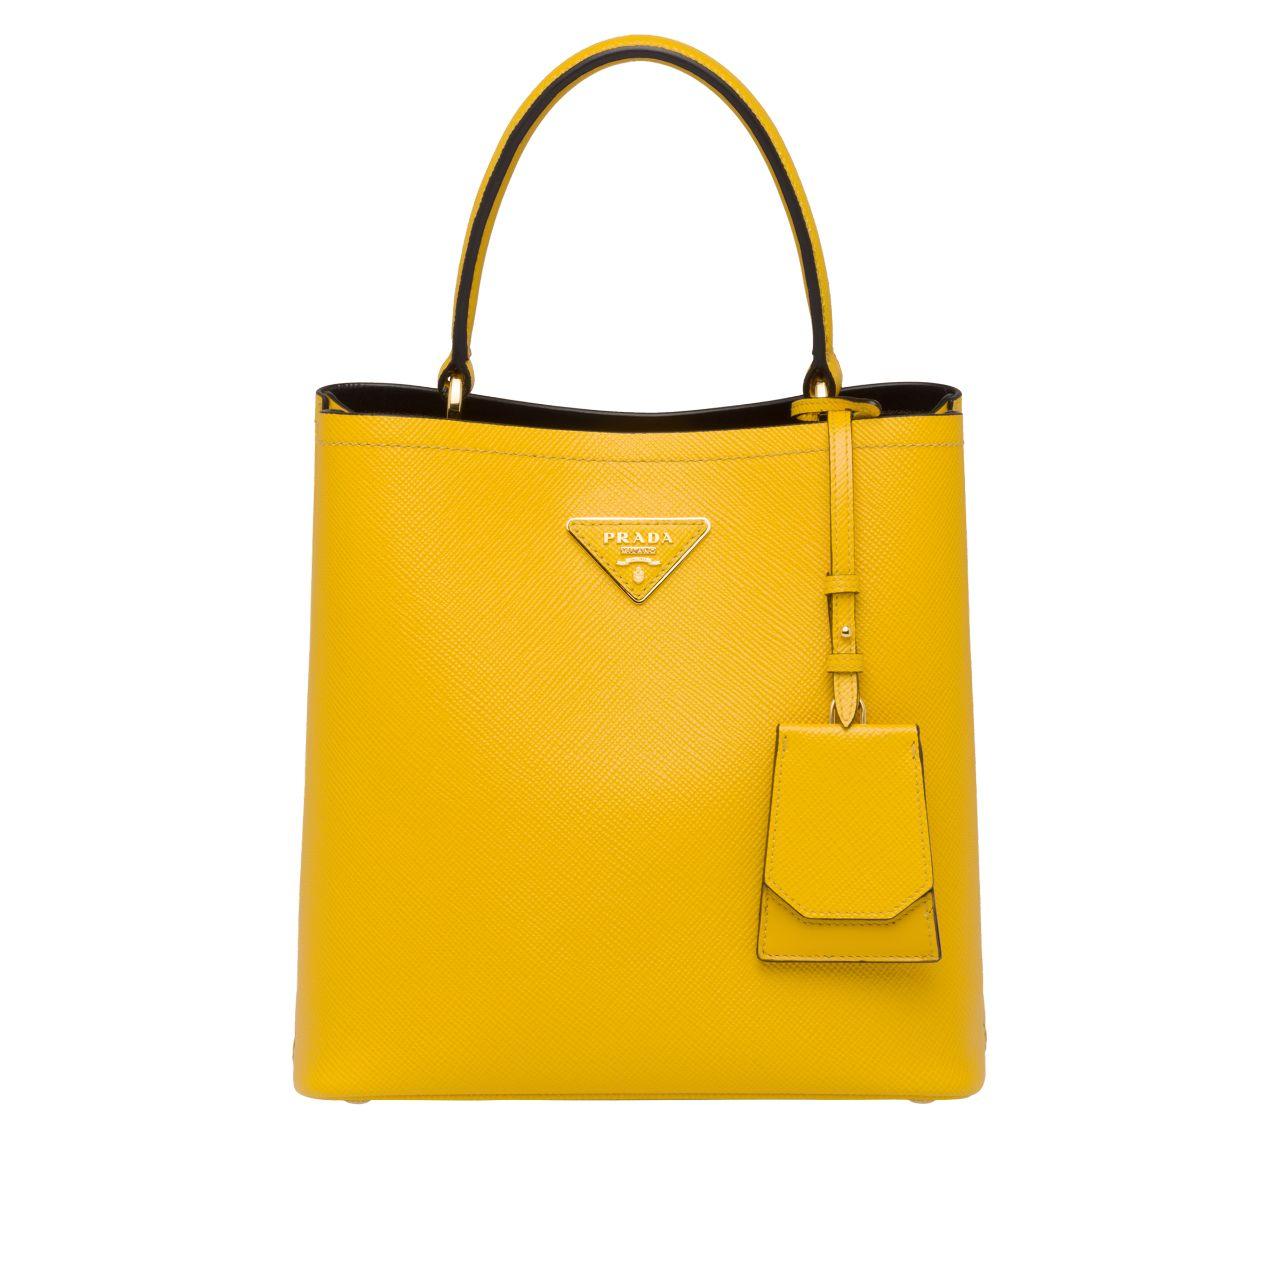 Borsa a mano Prada Double Medium Saffiano giallo estate 2019 prezzo 1750 euro